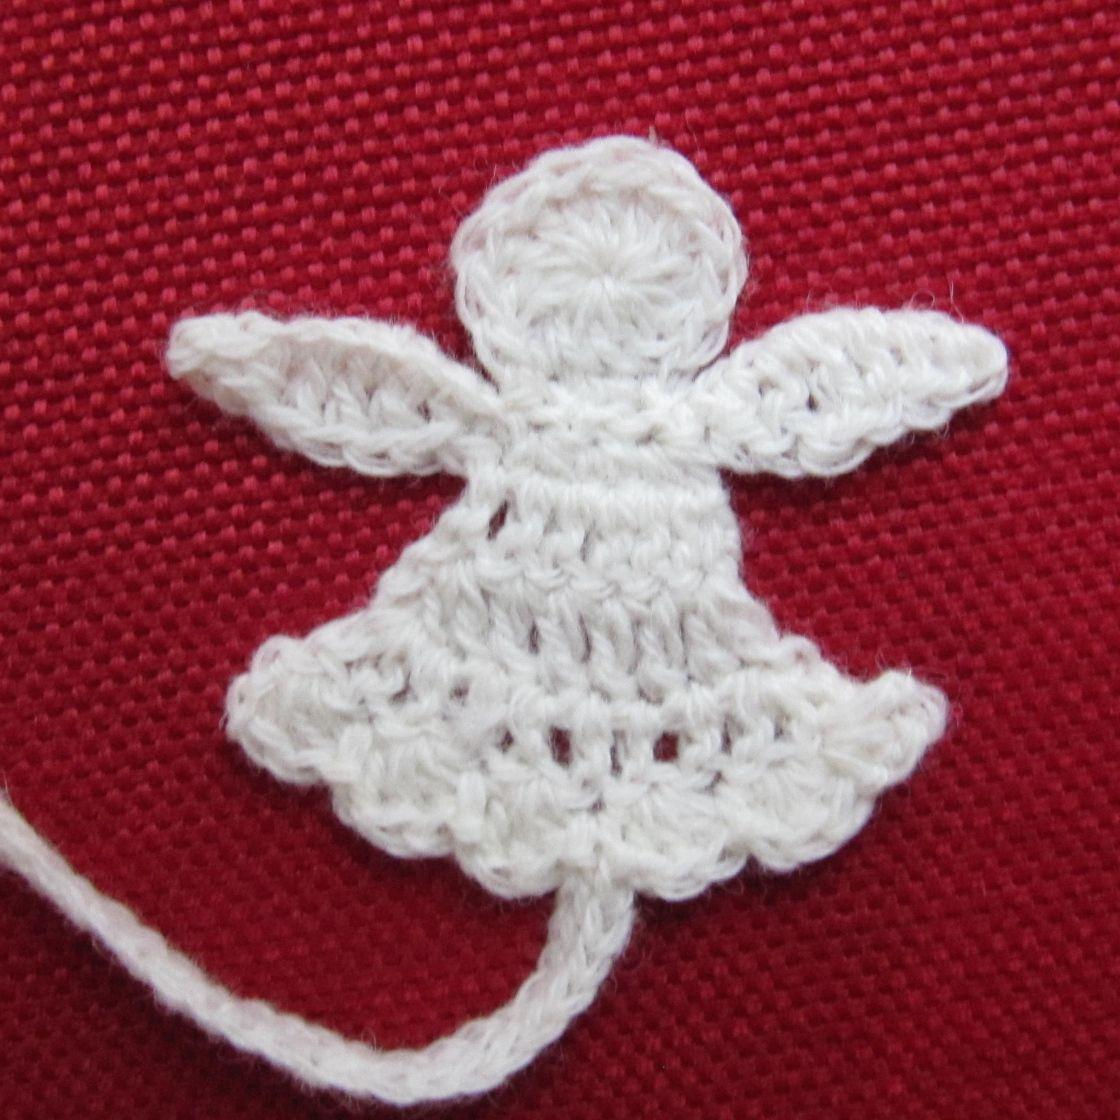 Anleitung Für Einen Gehäkelten Engel Handmade Crochet Crochet